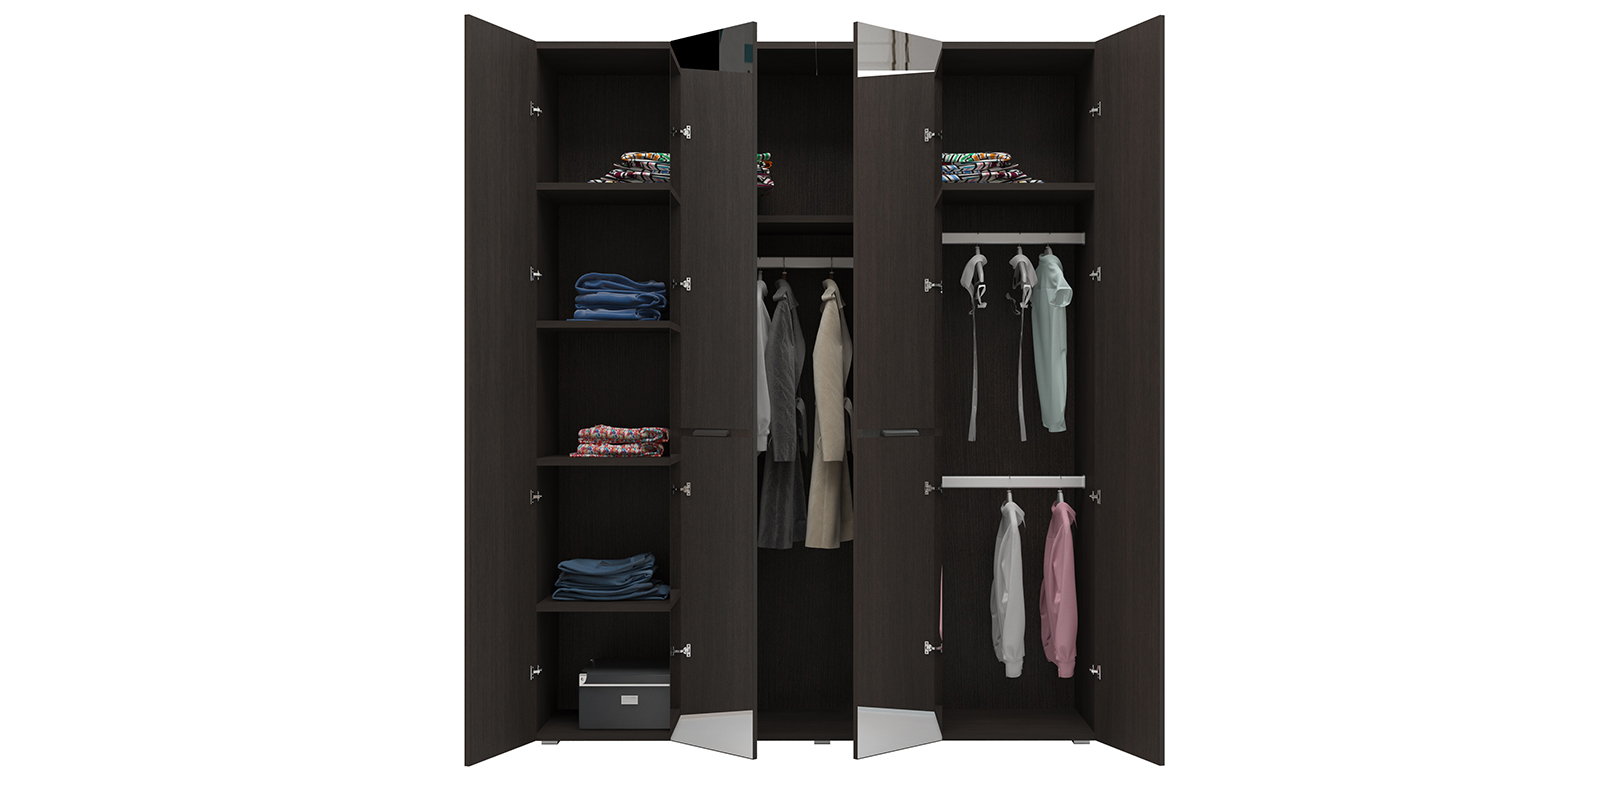 Шкаф распашной четырехдверный Калгари (дуб кастано/зеркало) от HomeMe.ru